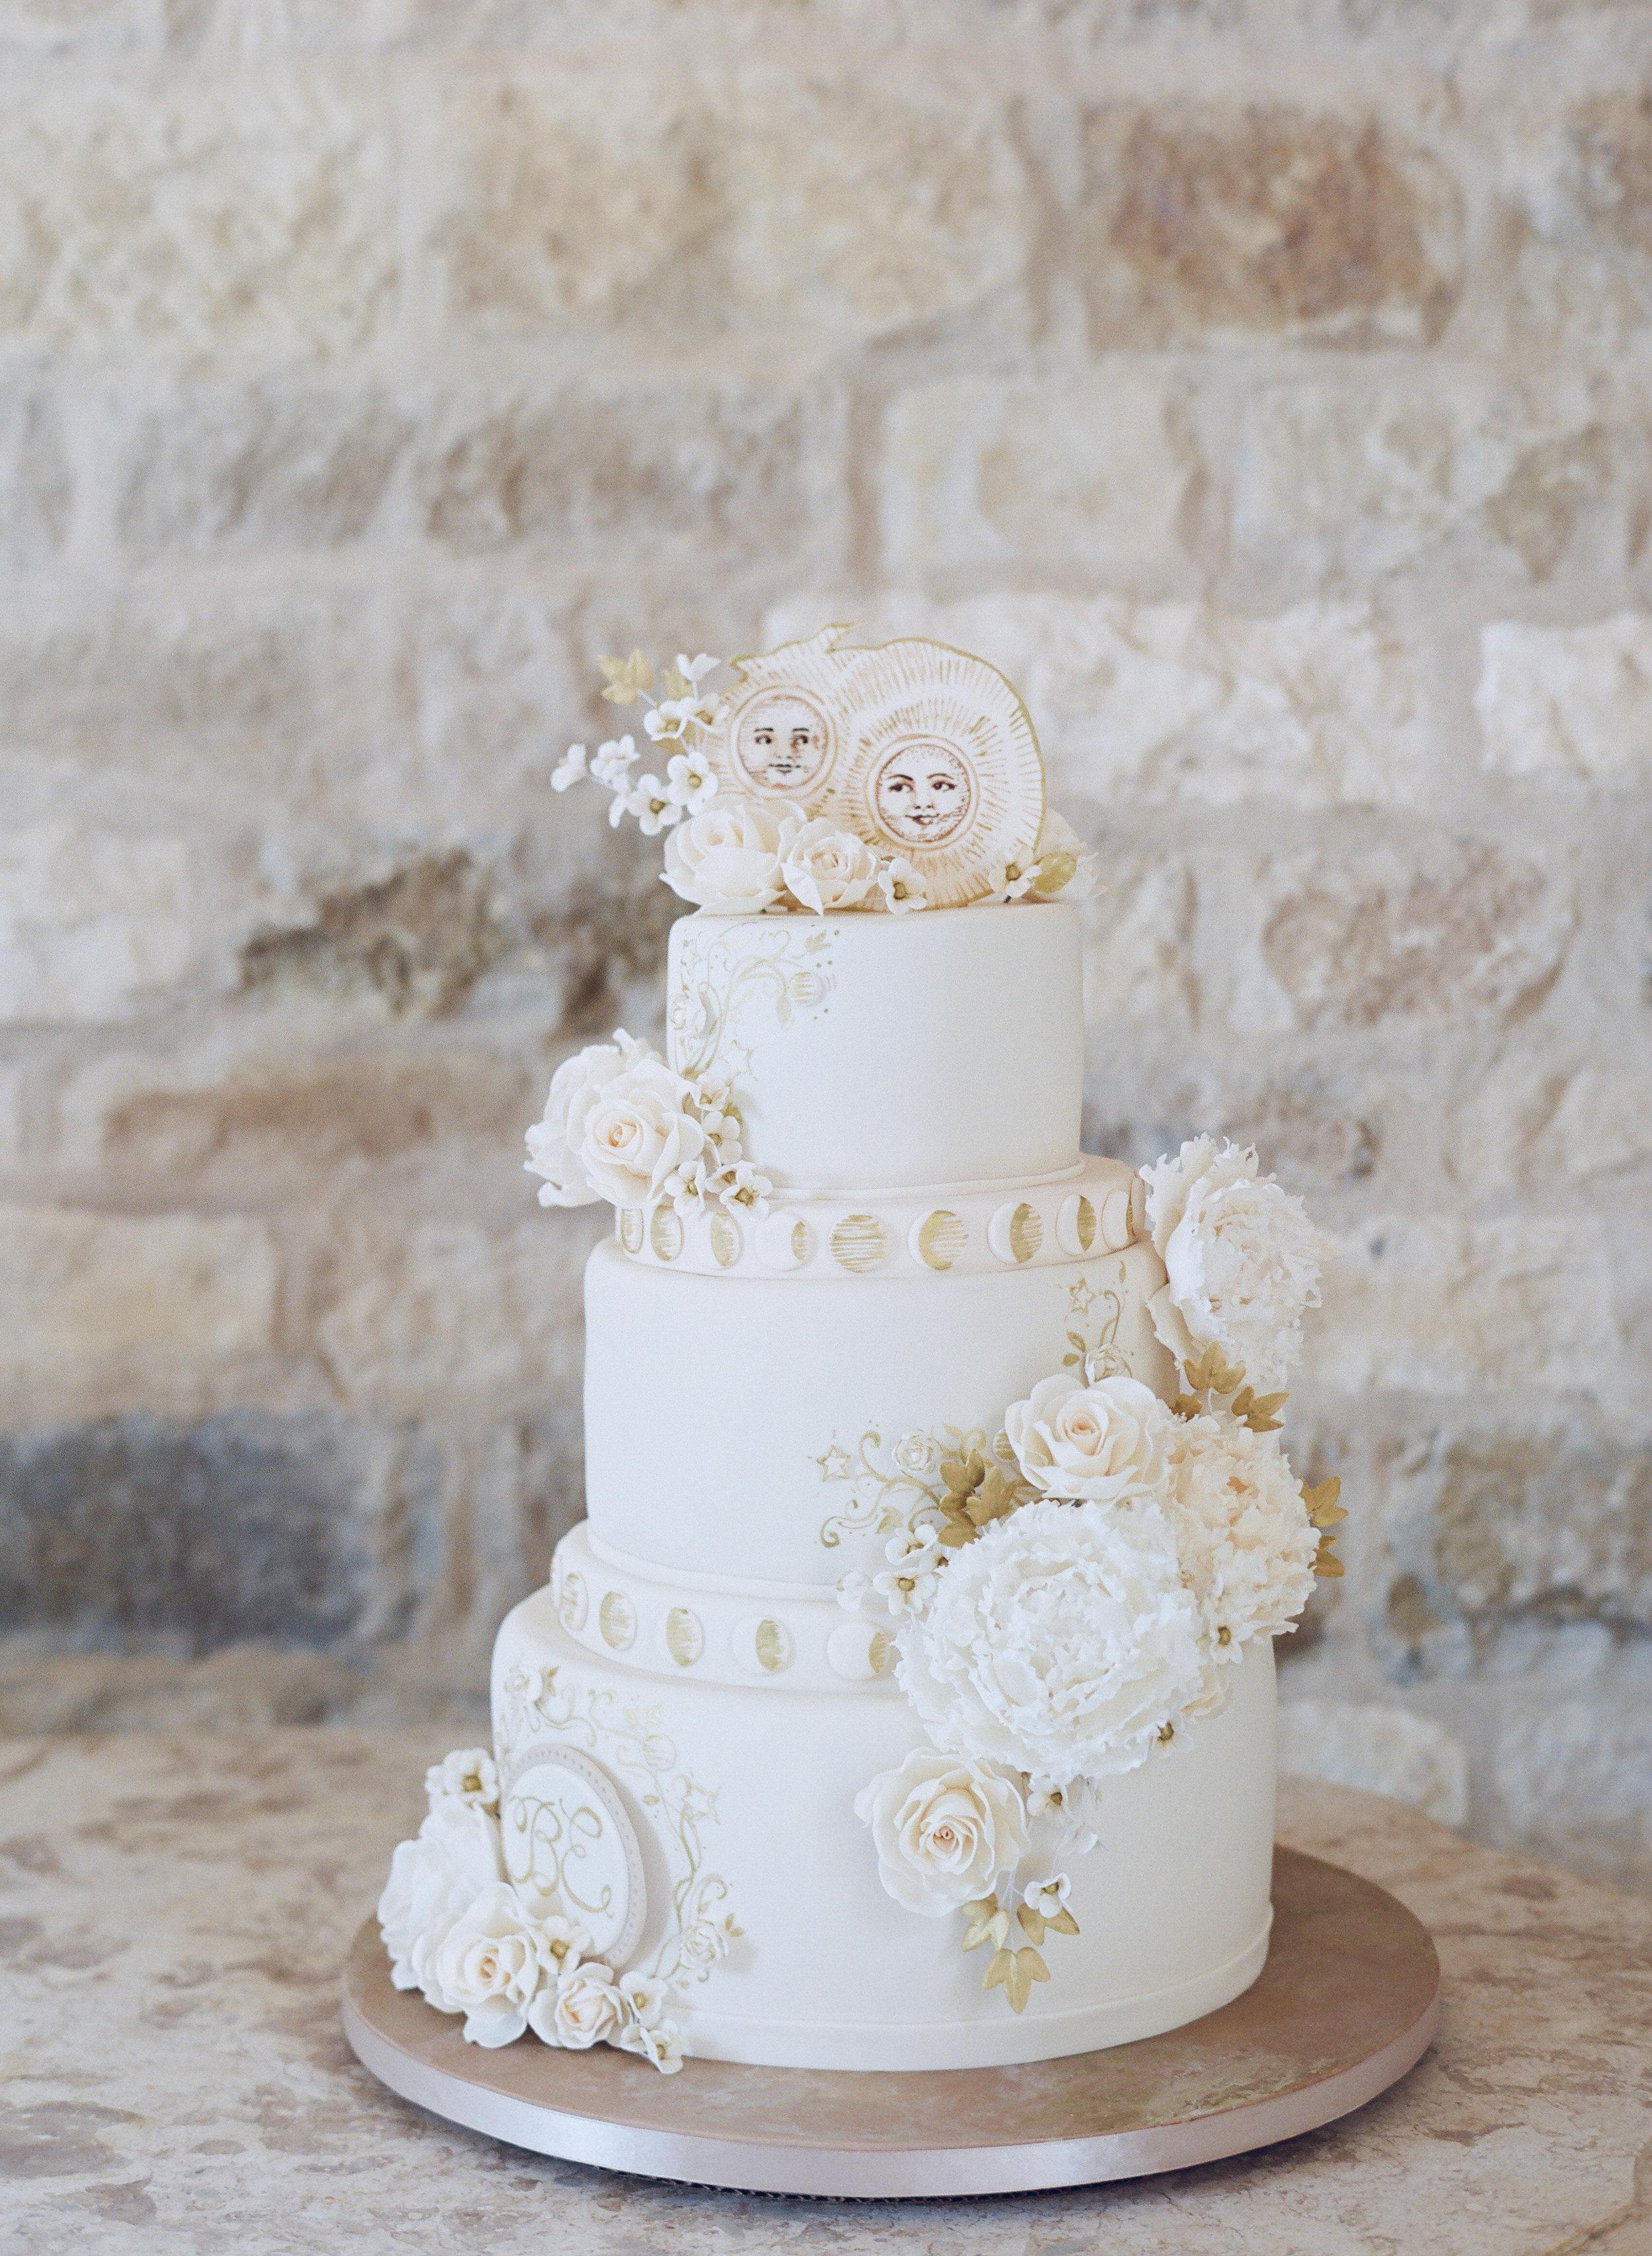 www.santabarbarawedding.com | Santa Barbara Wedding Style | Pink Buttercream frosting Three tier wedding cake | Merryl Brown Events | Elizabeth Messina Photography | ROBYN LOVES CAKE